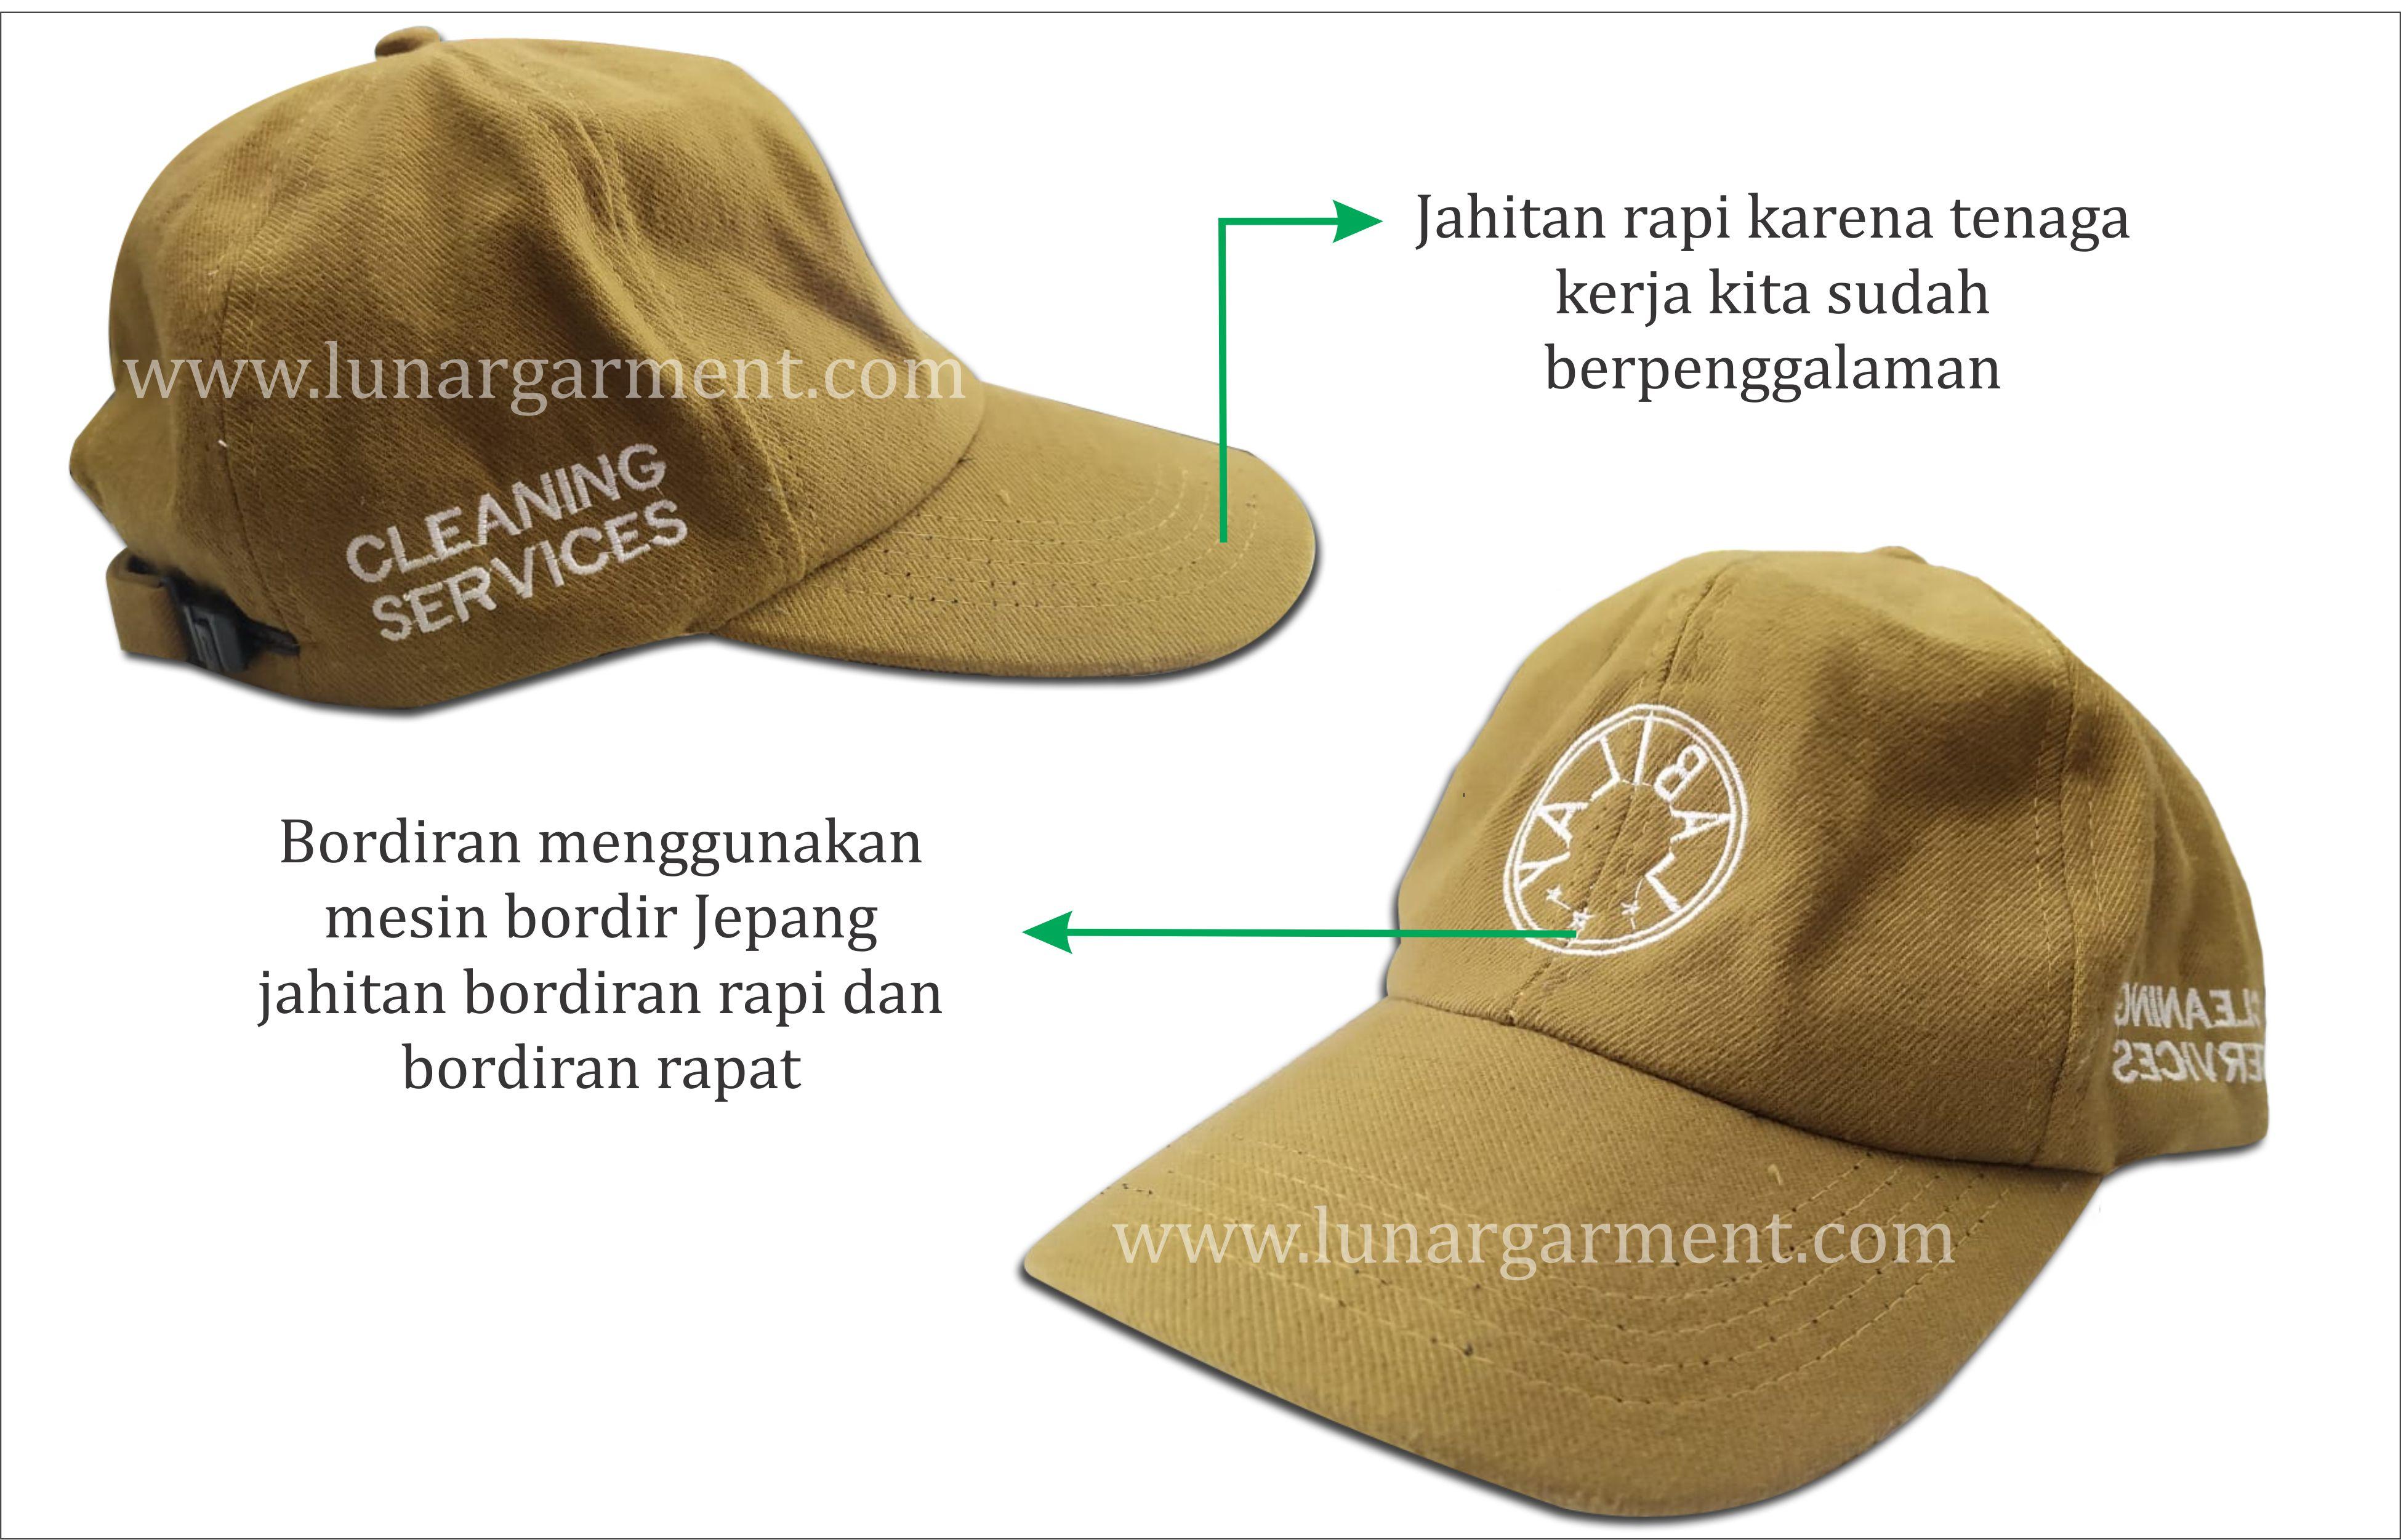 Konveksi Topi Custom Surabaya